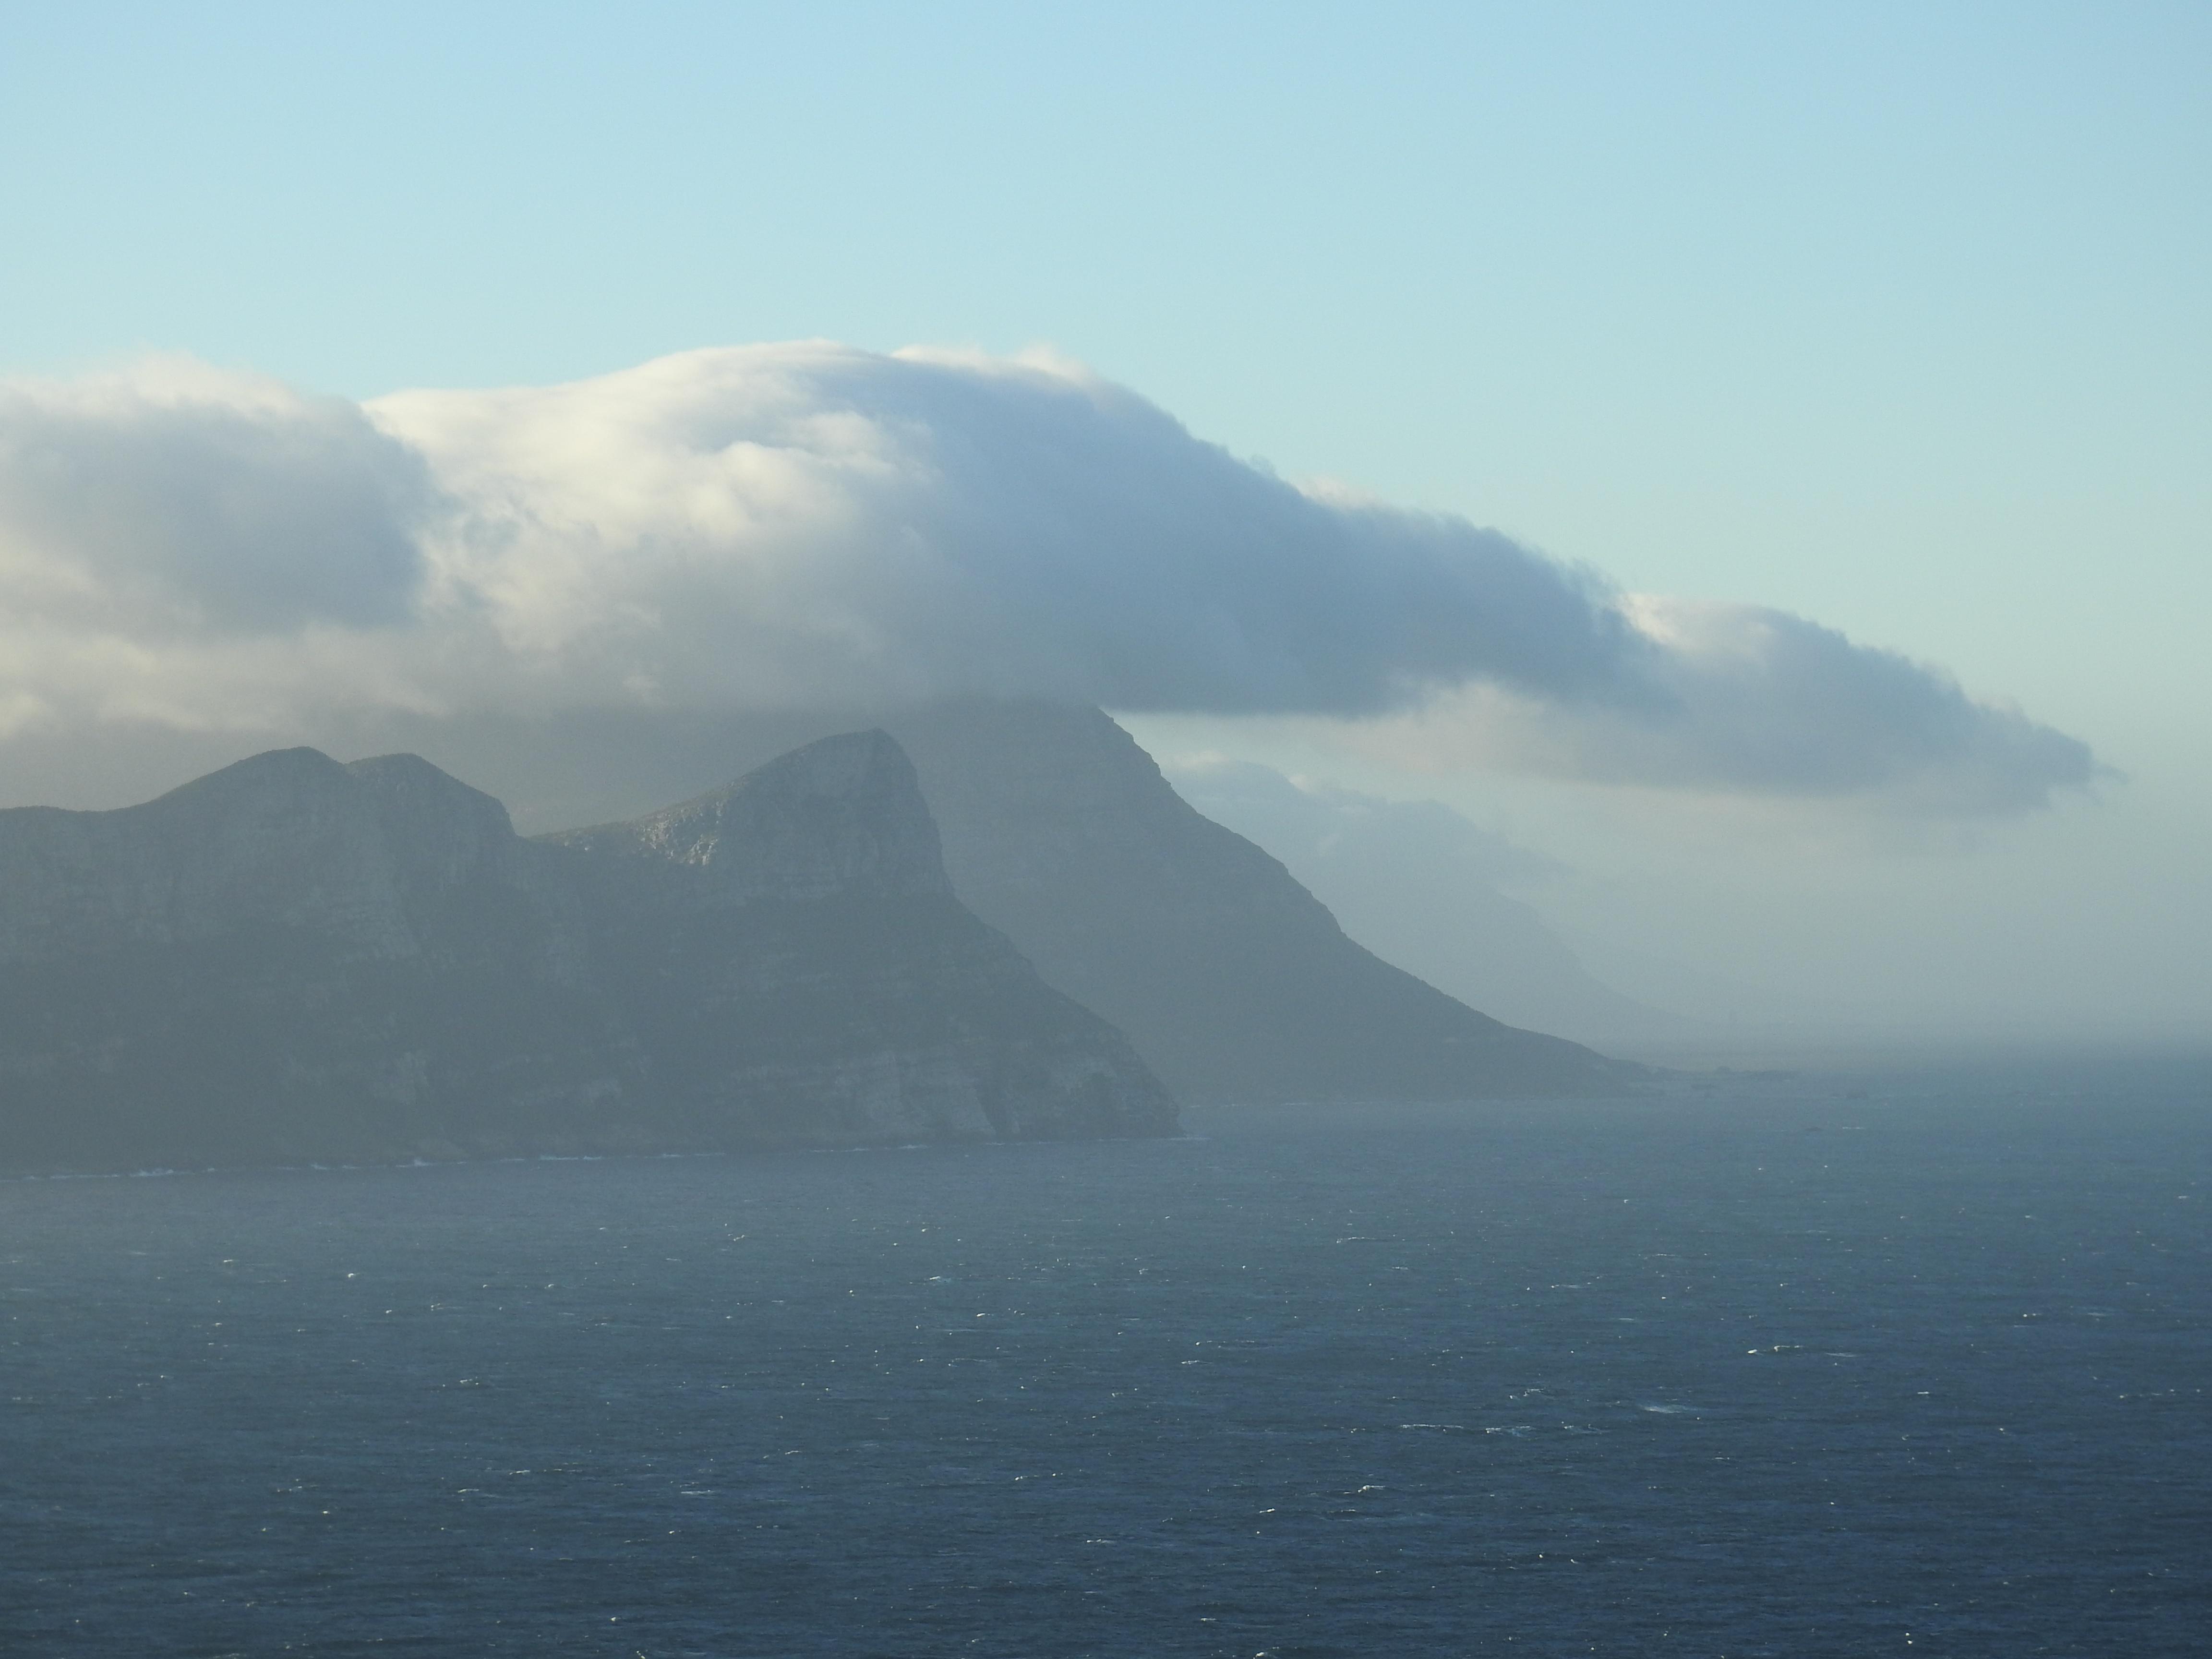 Cool_clouds_mountain_sea-1.jpg